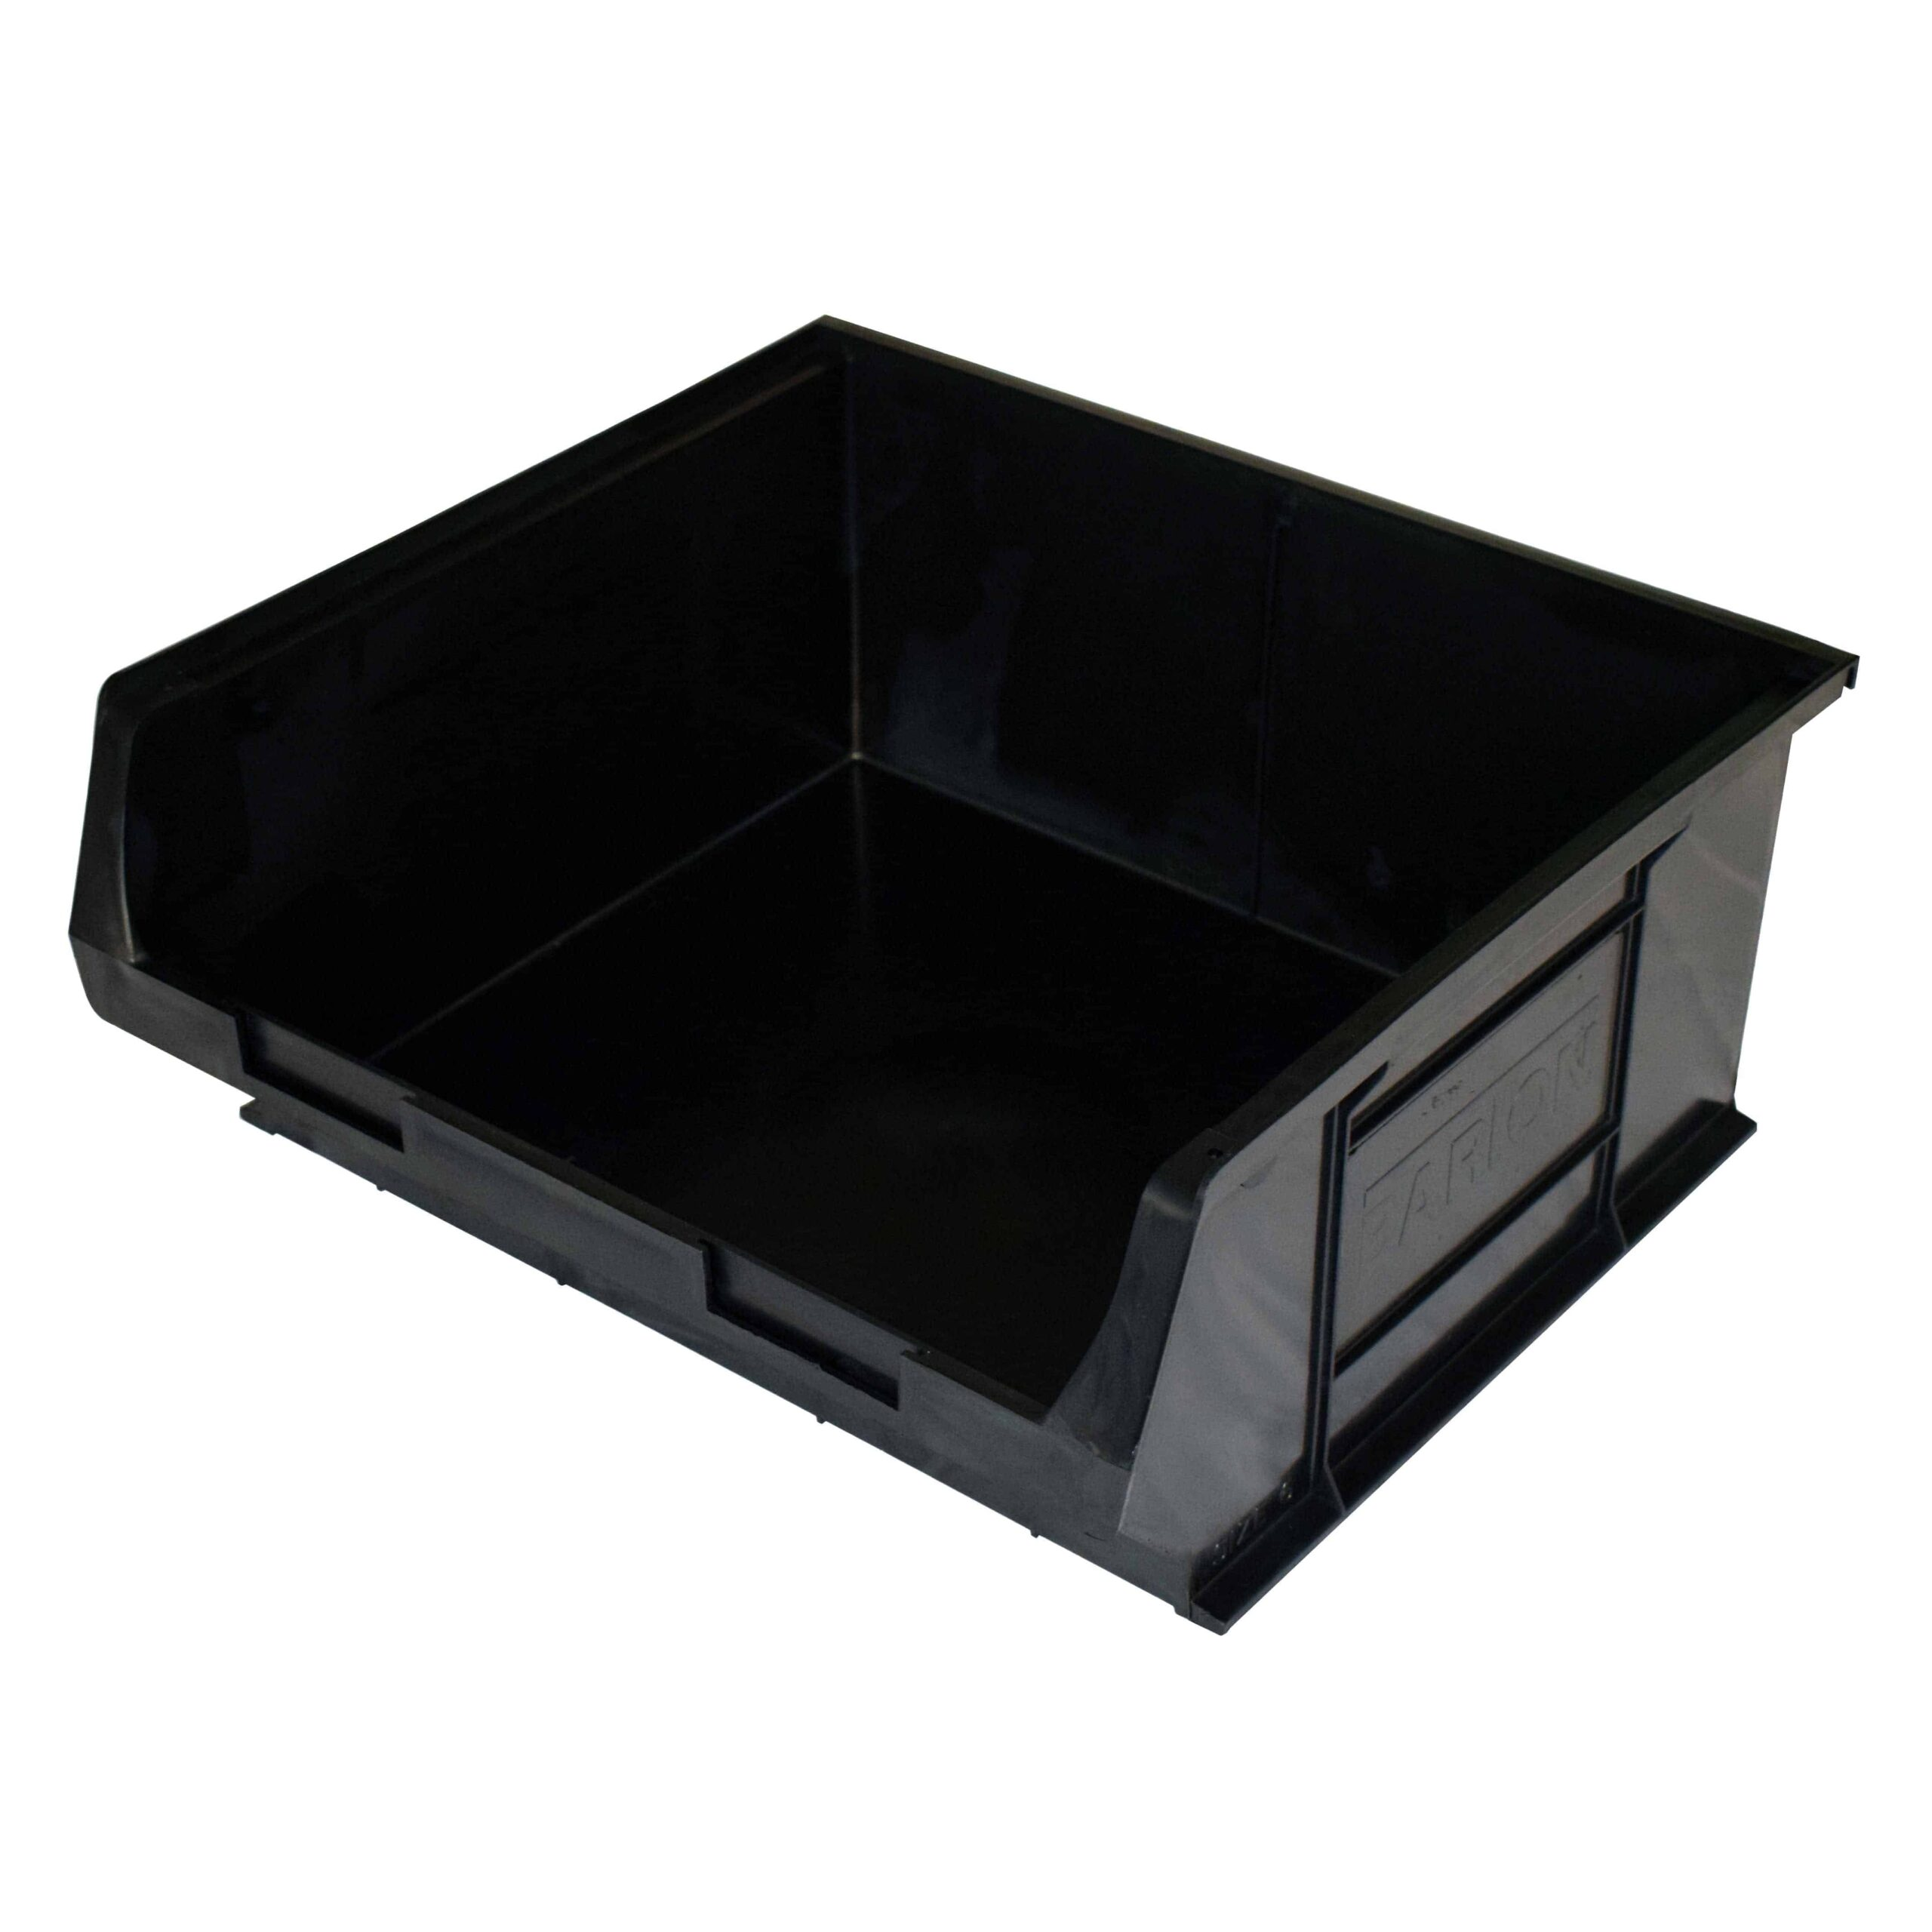 Barton STC6 Black Anti-Static Containers